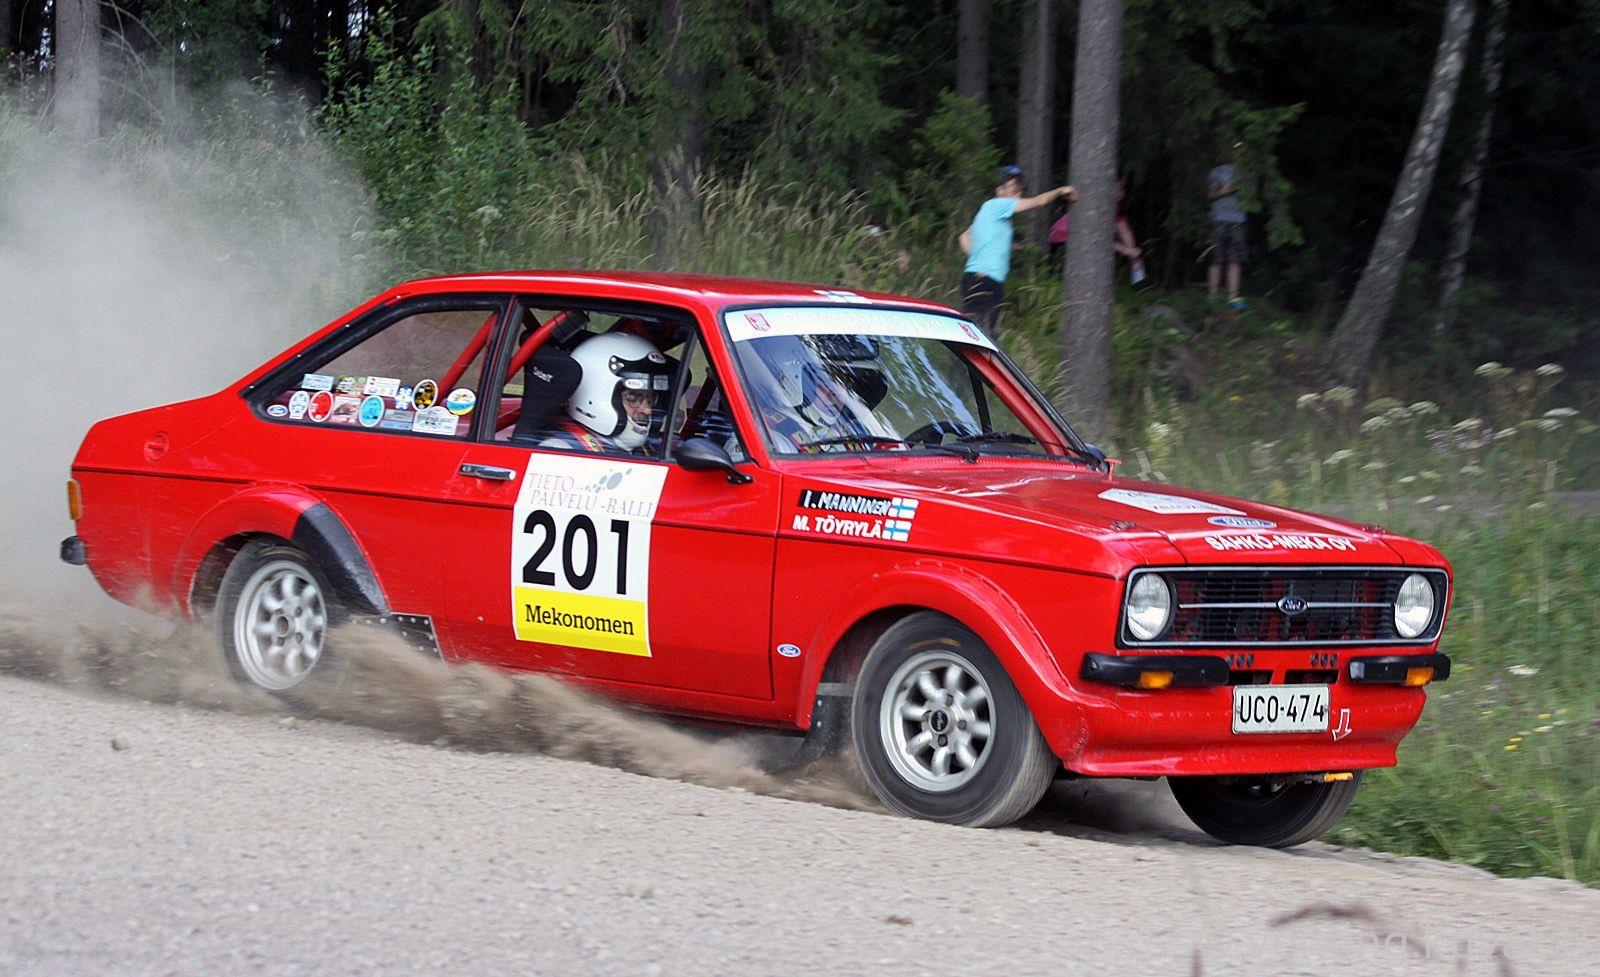 Ford Escort Mk2 Rally Car | Classic Cars | Pinterest | Rally car ...